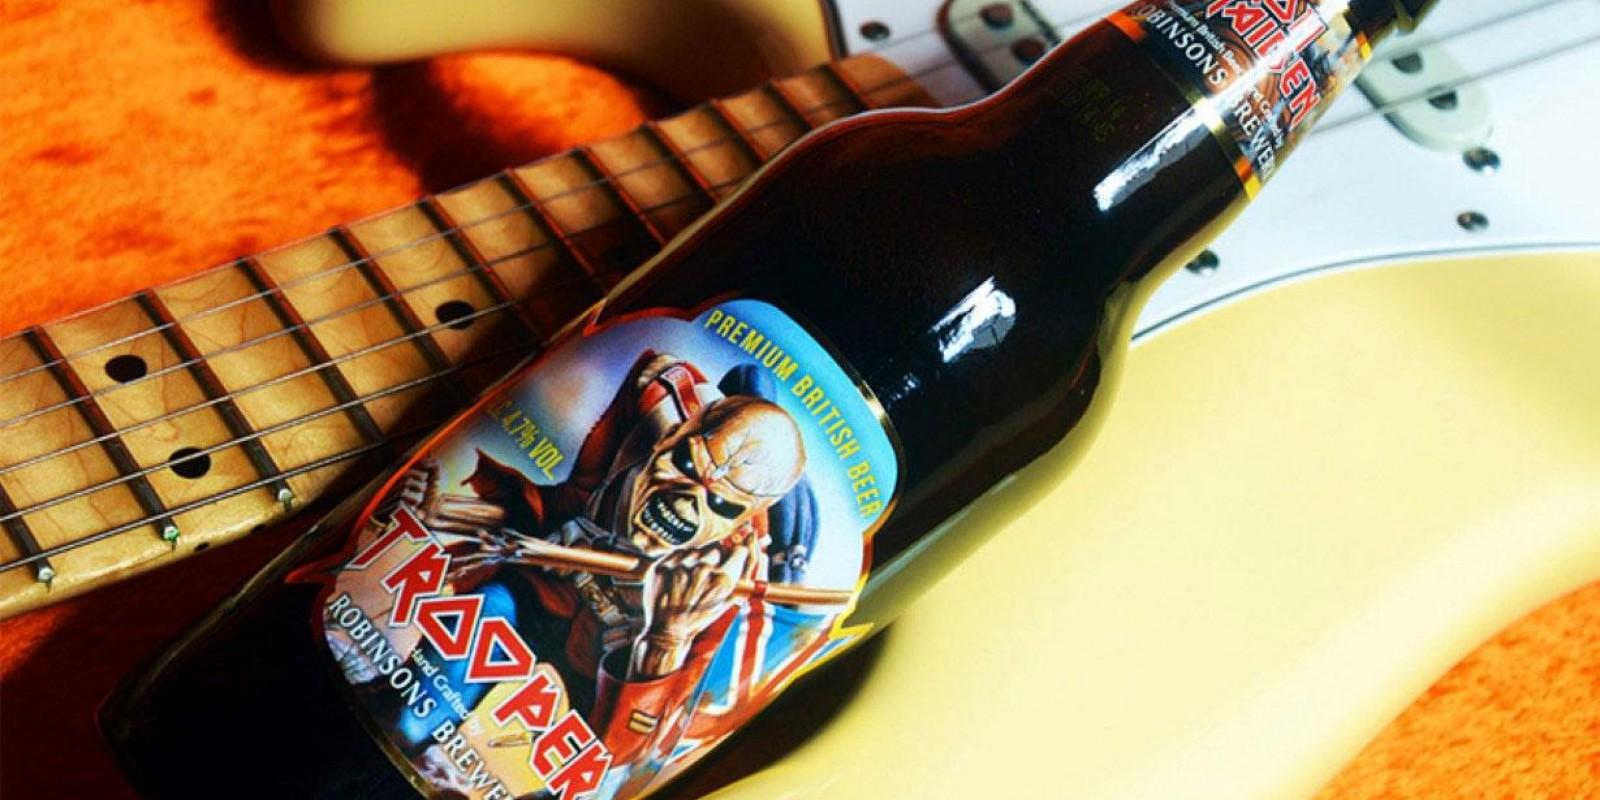 Rock n' Roll e Muita Cerveja